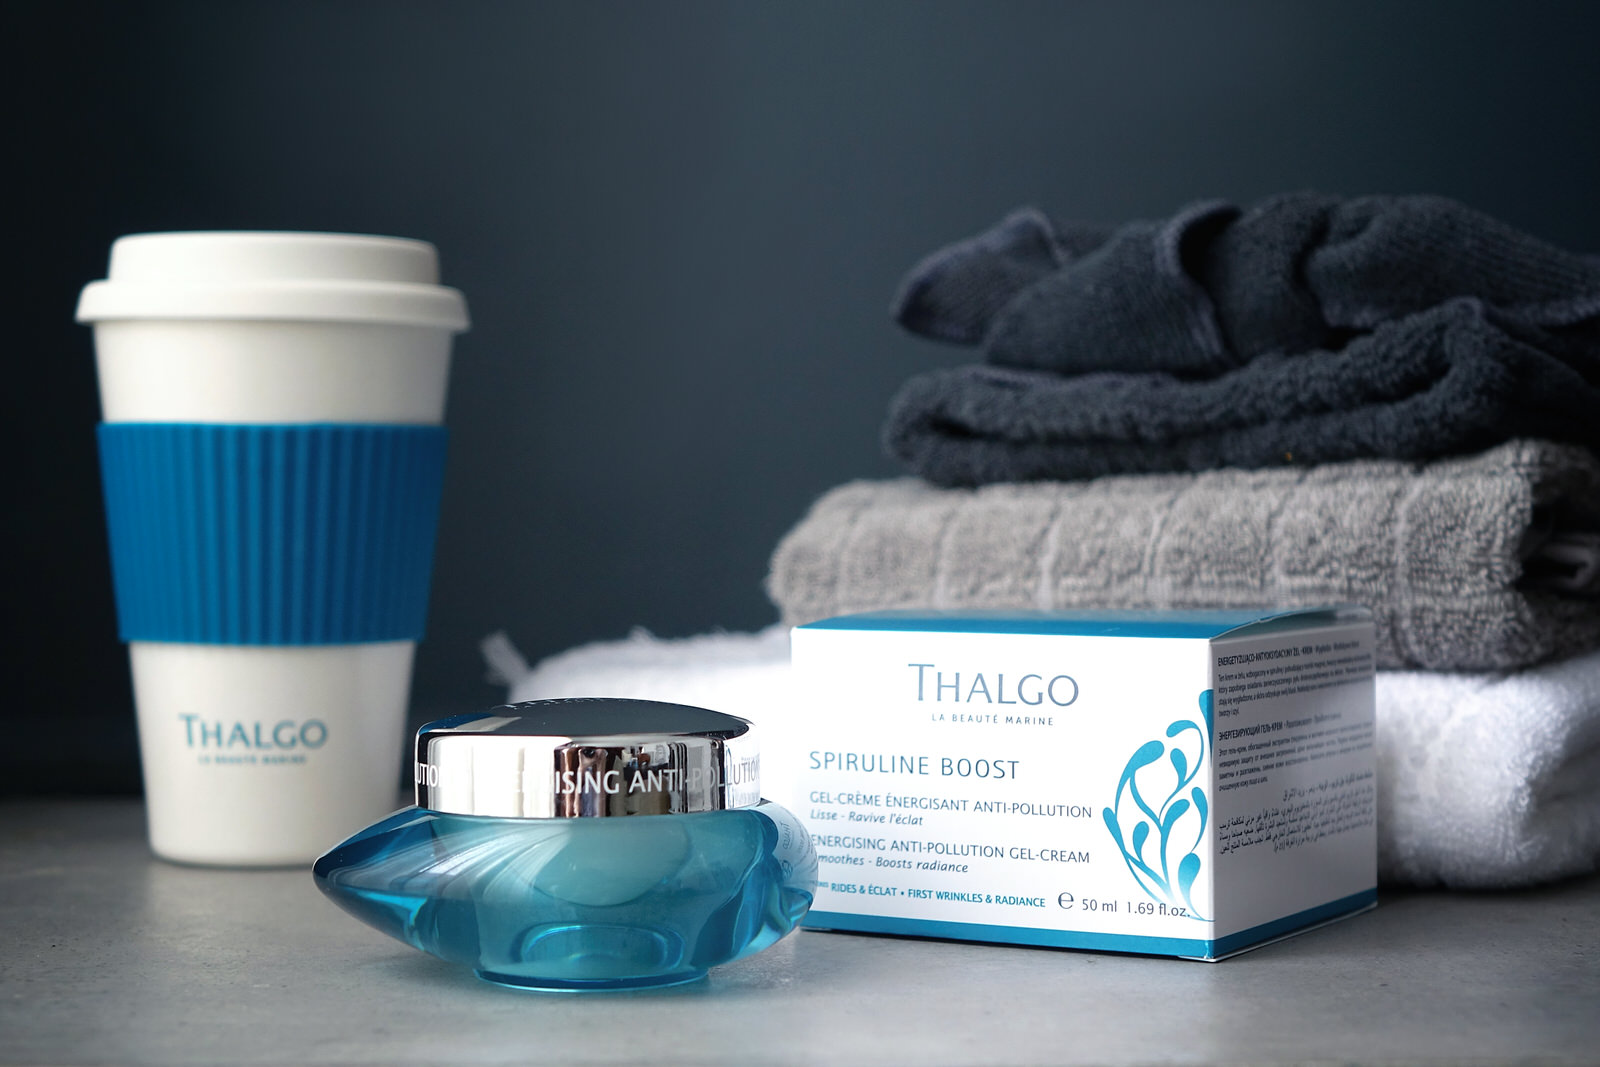 La nouvelle gamme In & Out Spiruline Boost de Thalgo